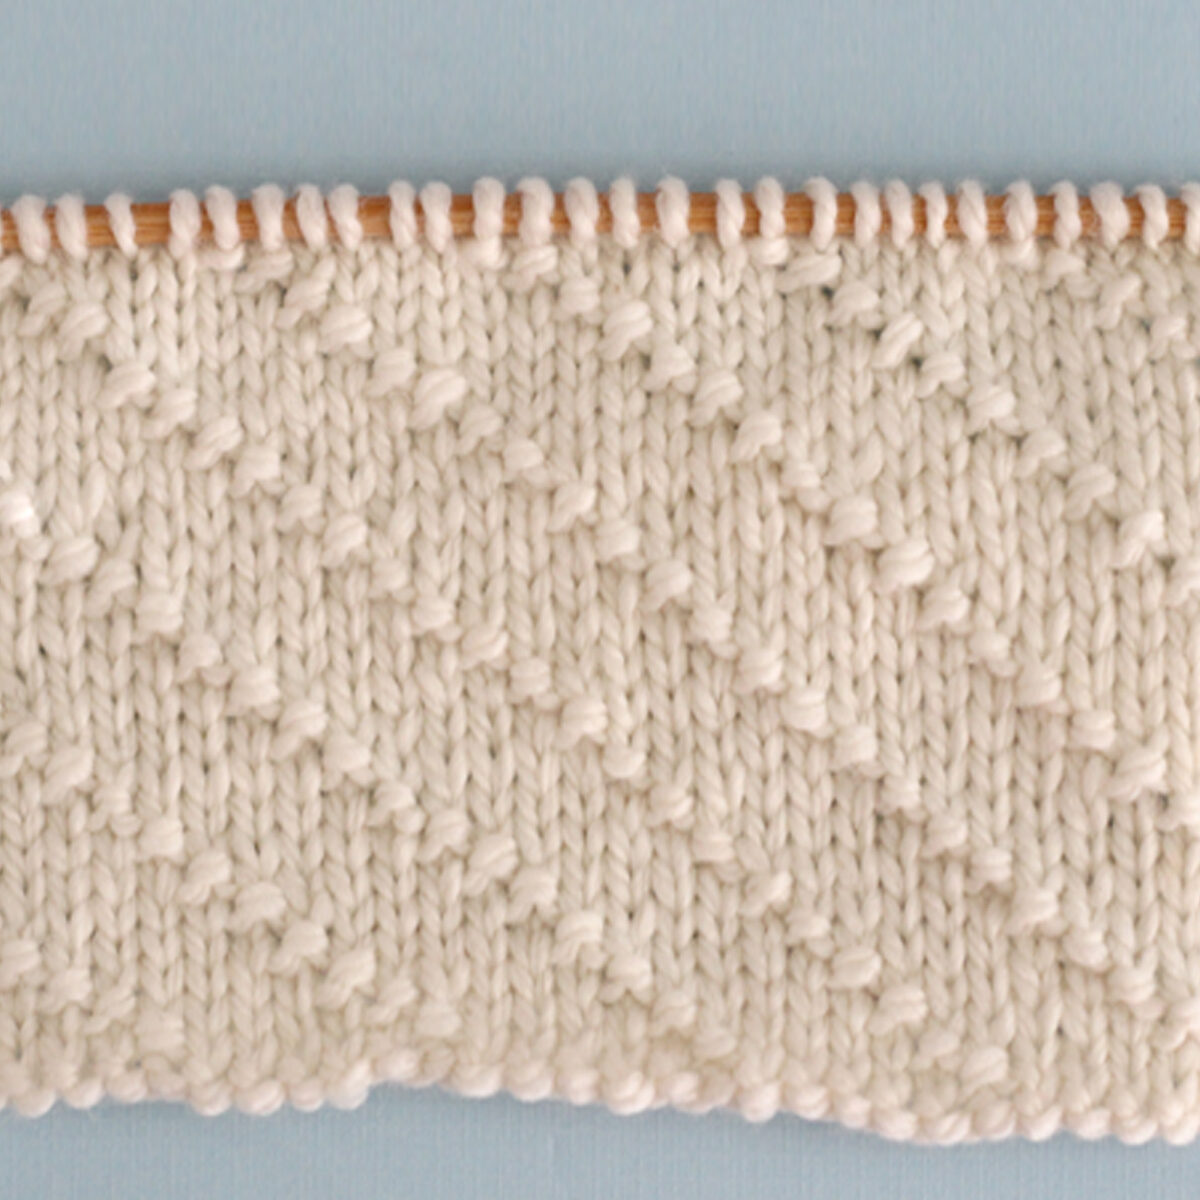 Diagonal Seed Knit Stitch Pattern in white yarn on knitting needle.